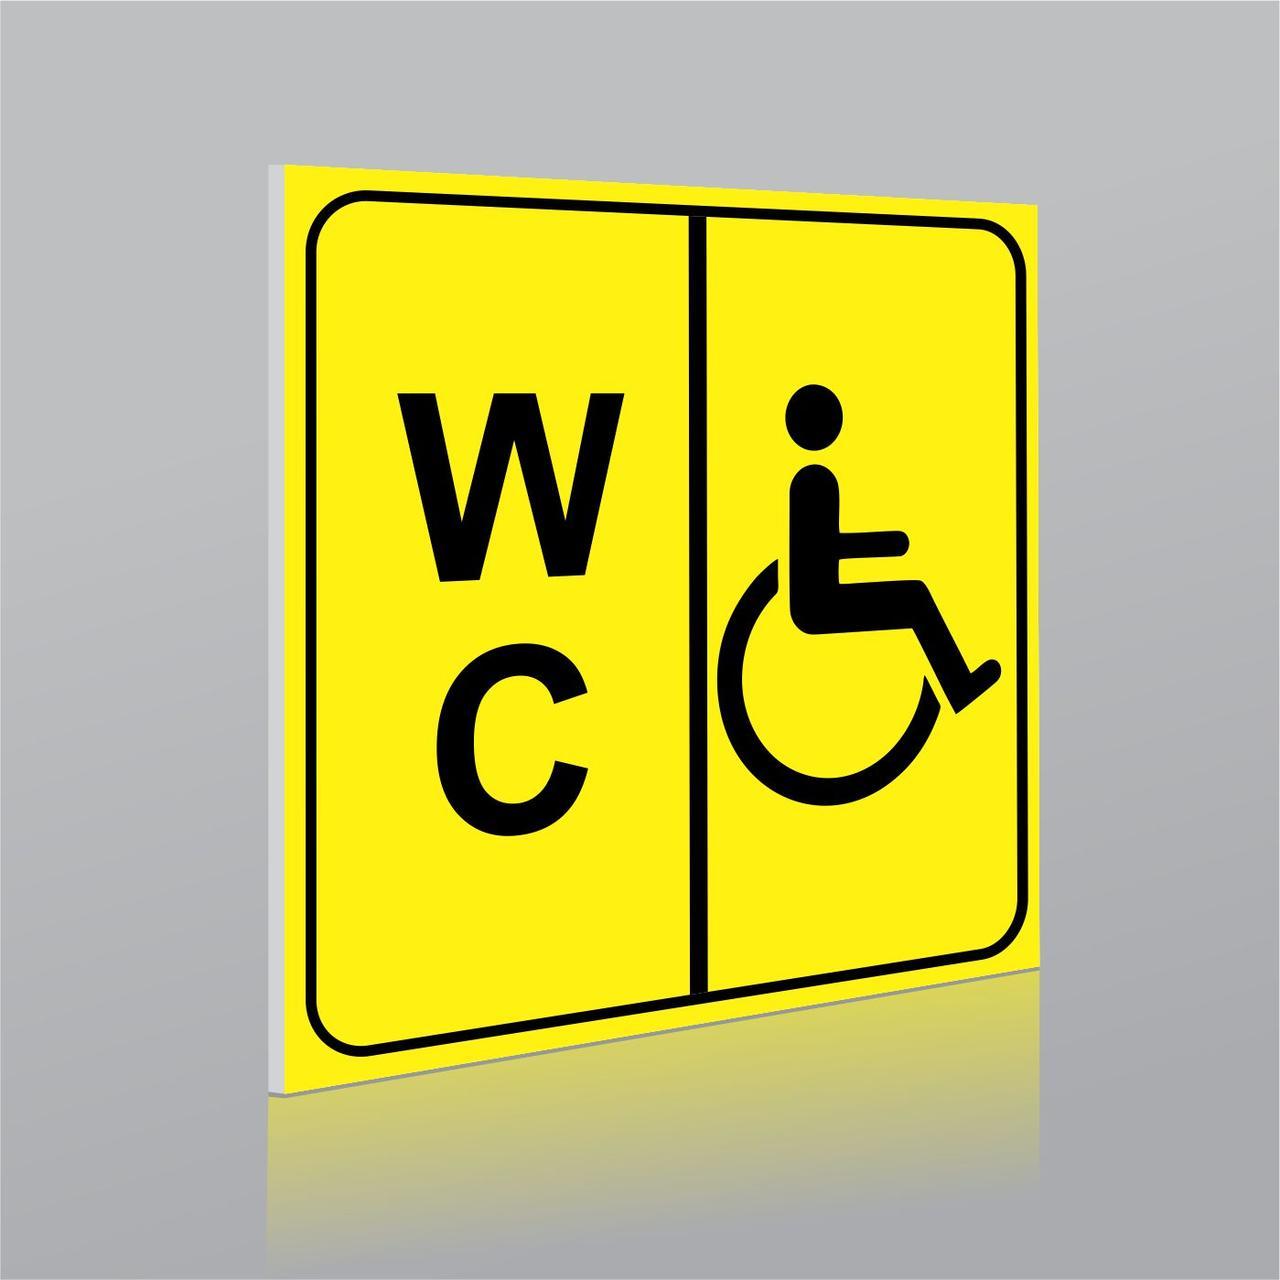 Таблички - Туалет для инвалидов